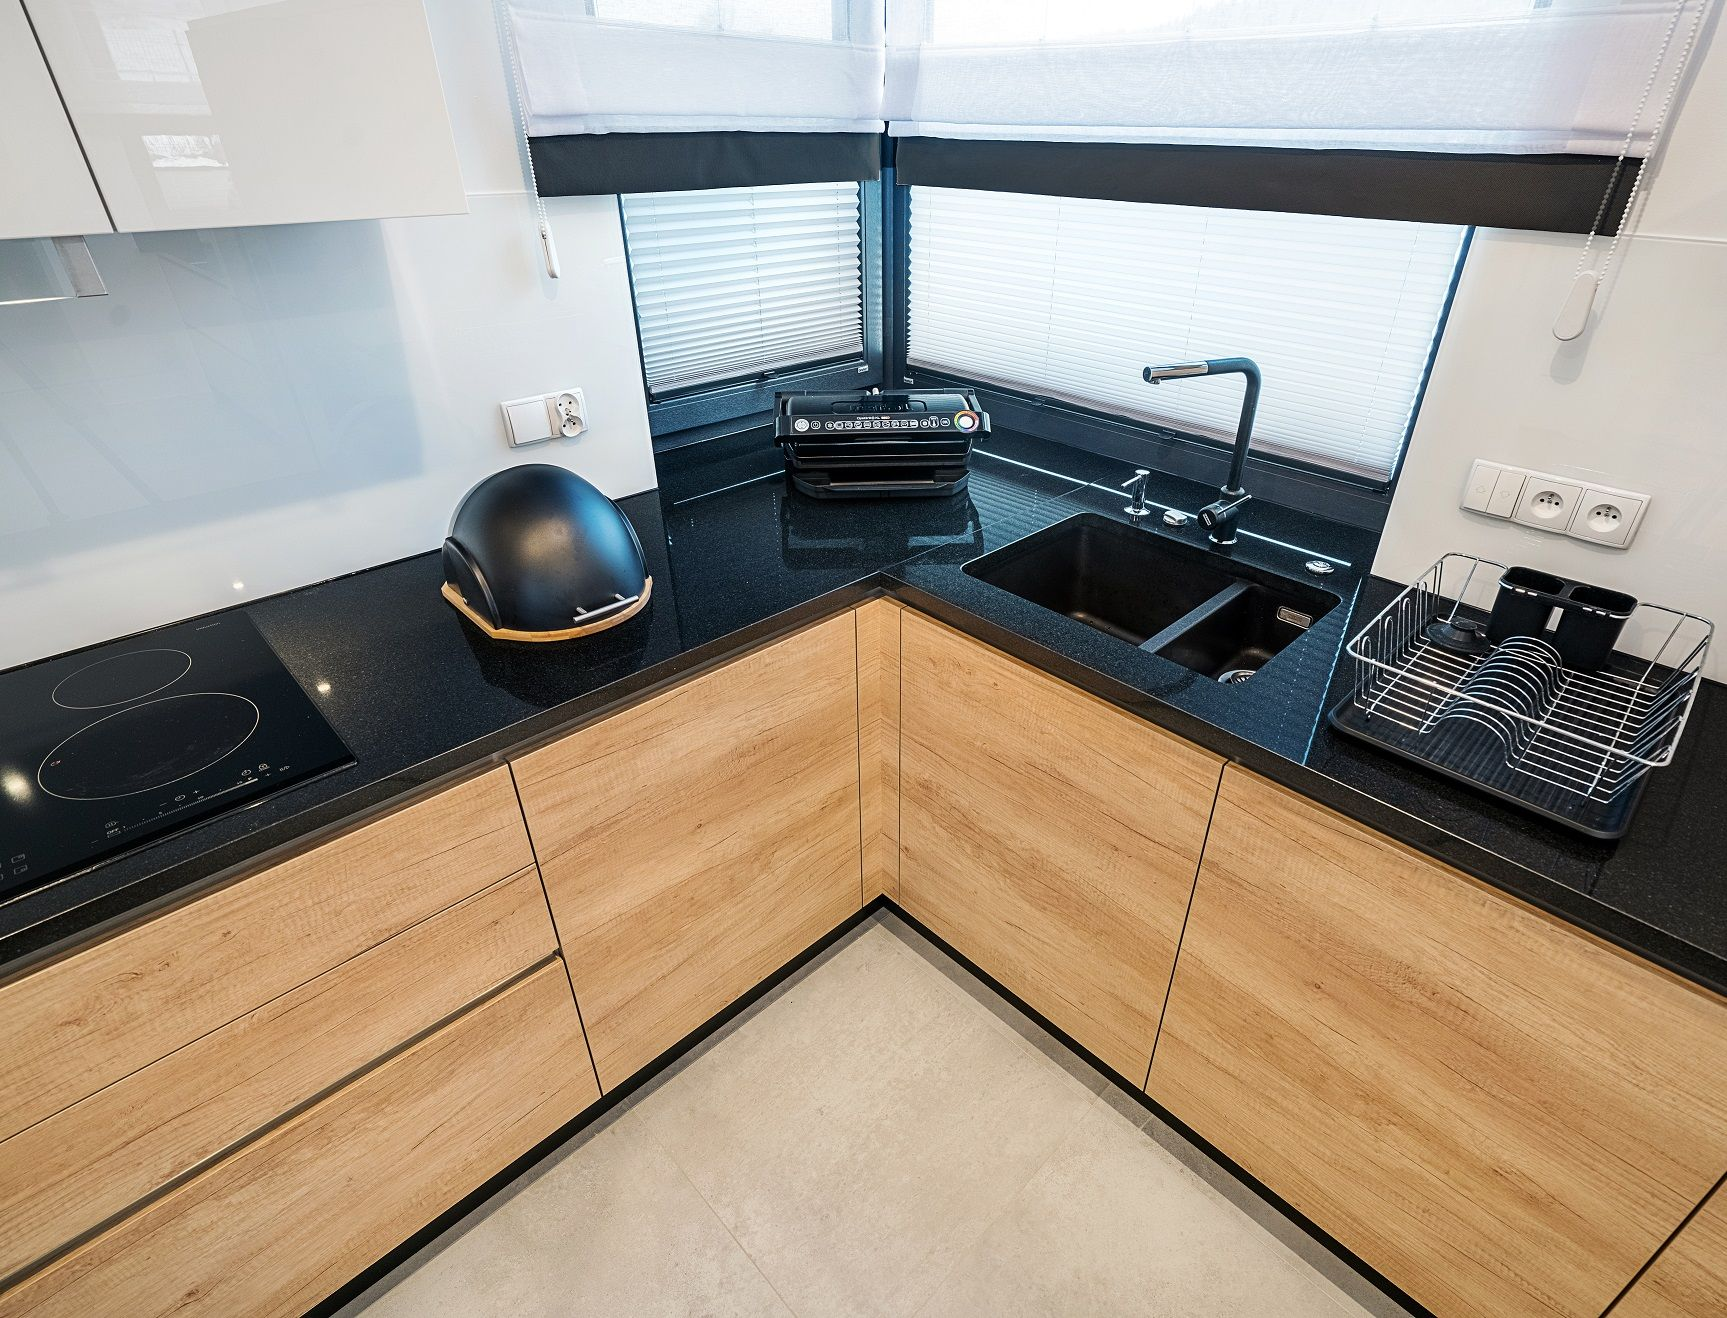 Granitowy Blat Rownowazy Cieply Odcien Frontow Kuchnia Aranzacja Design Kitchen Kitcheni Kitchen Decor Apartment Kitchen Furniture Design Kitchen Remodel